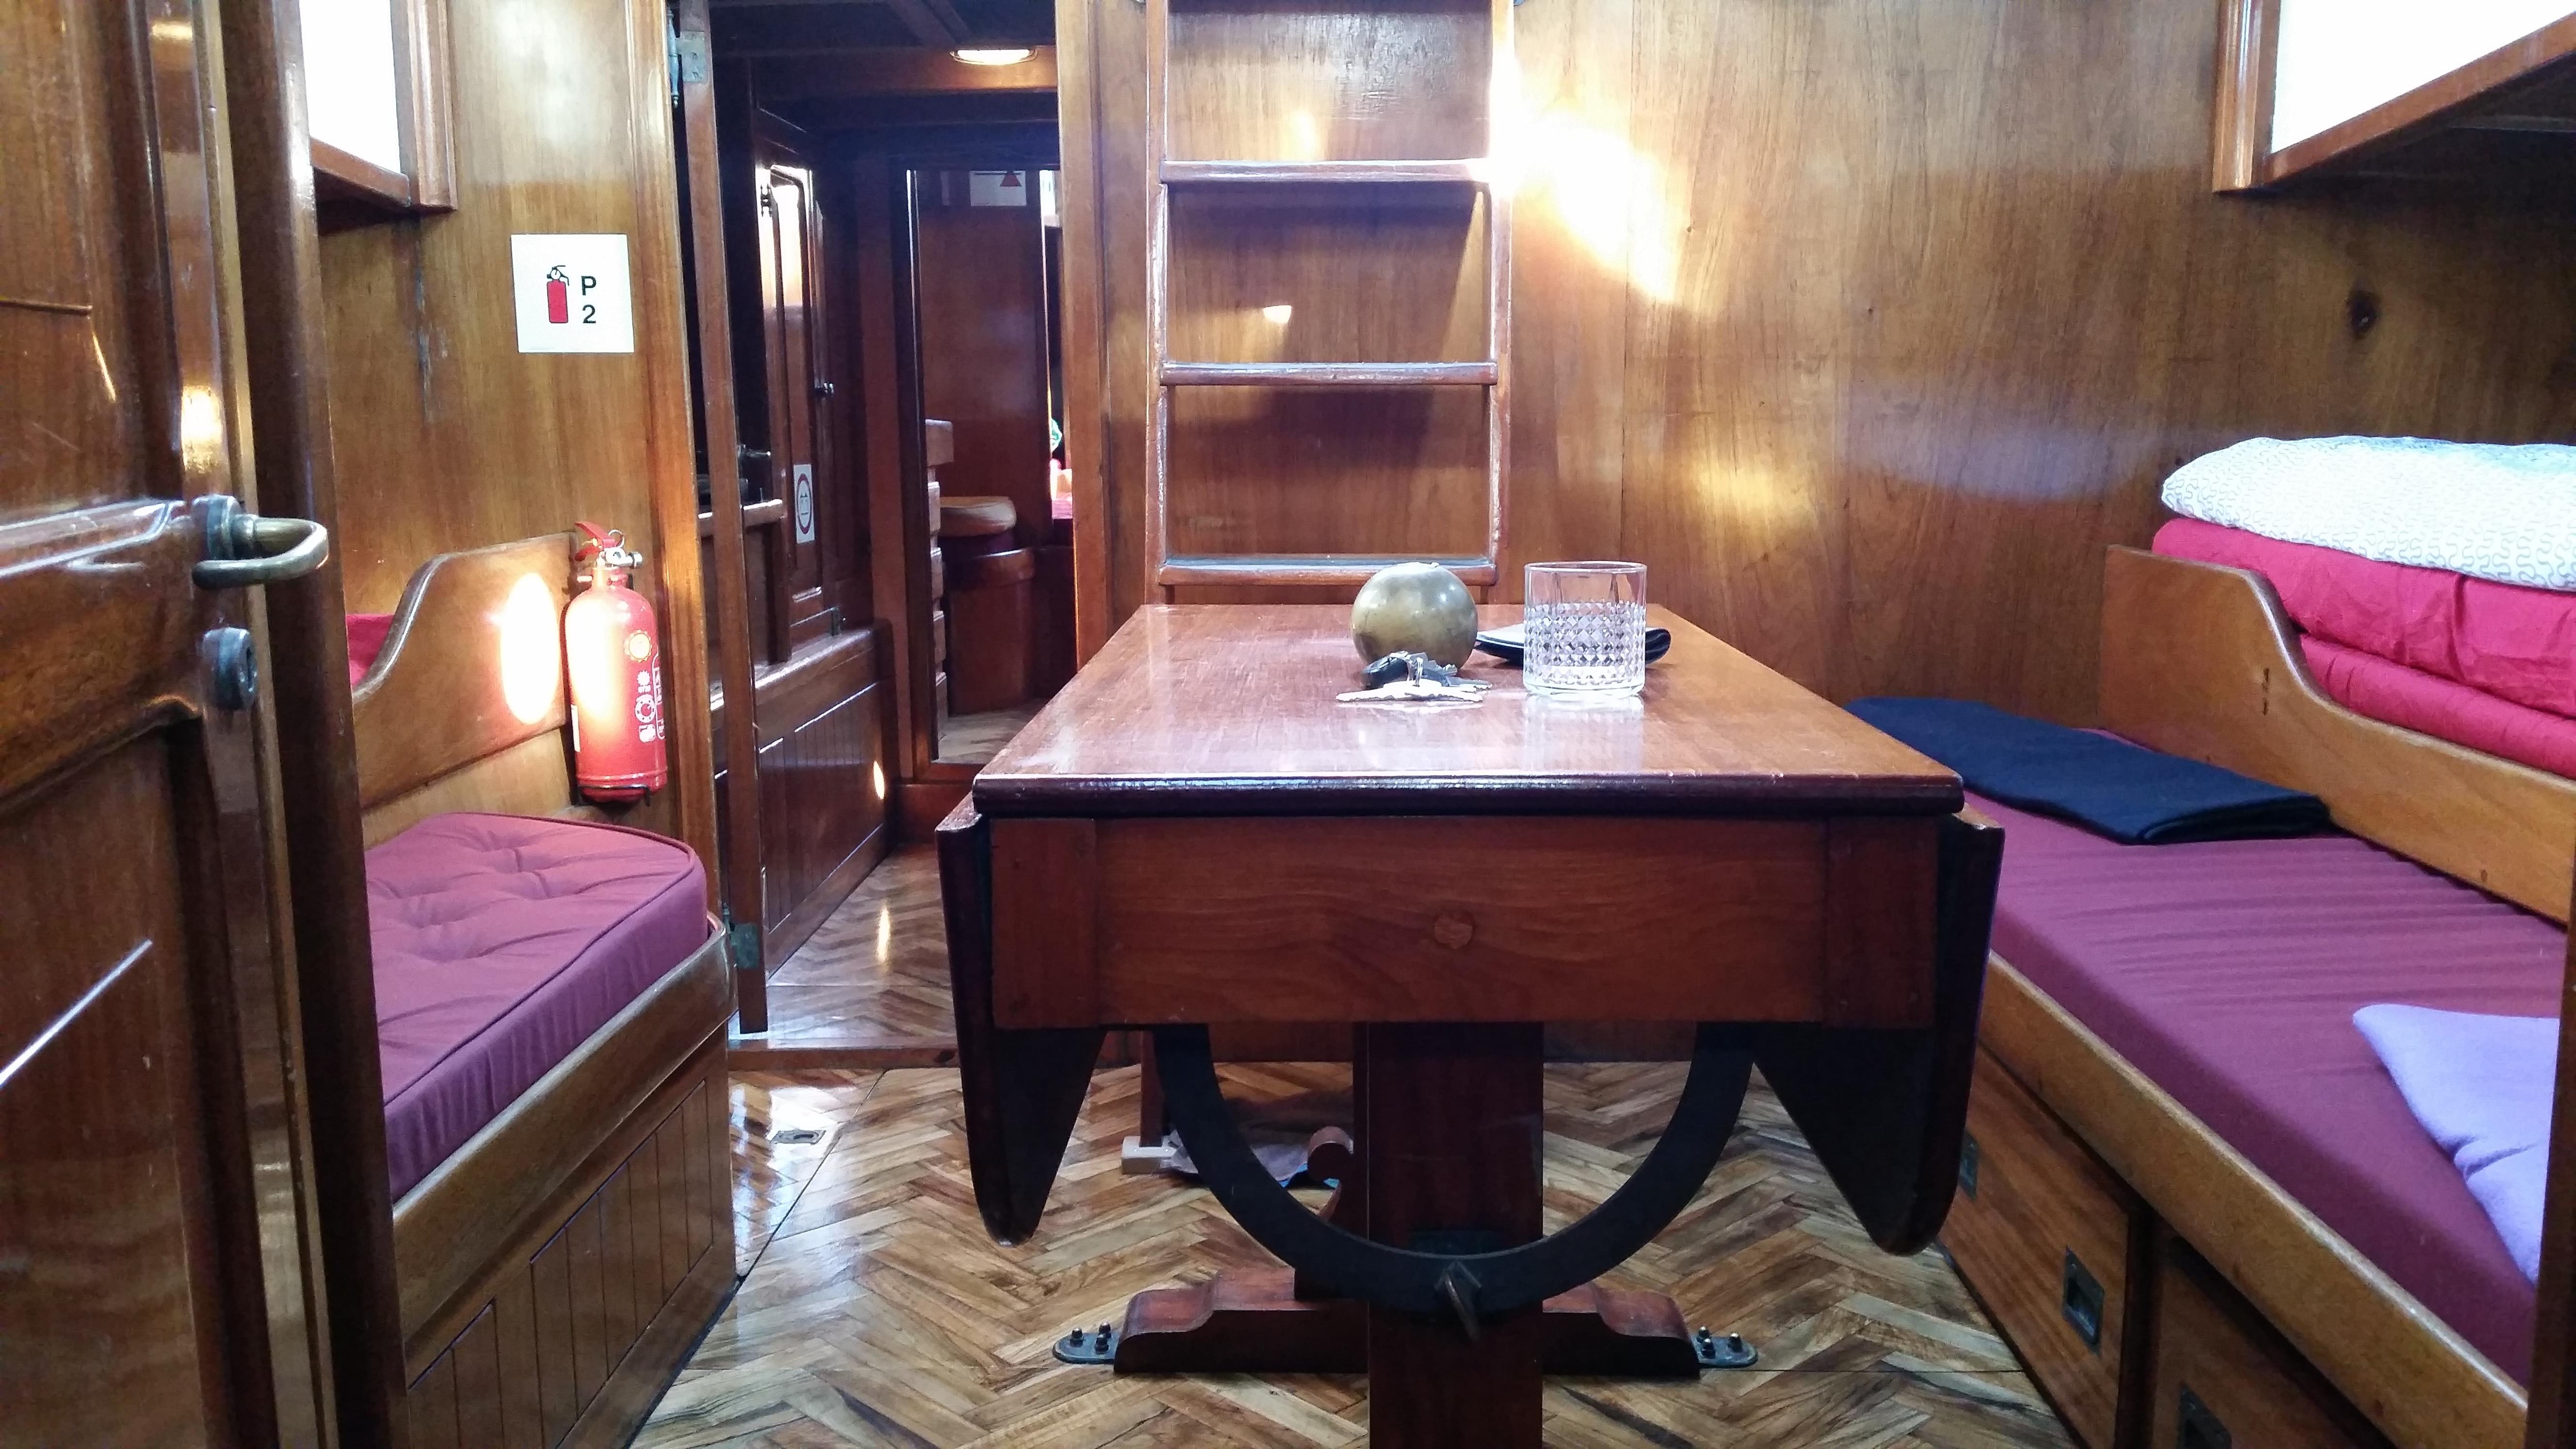 schooneryacht samyrah mieten in hamburg. Black Bedroom Furniture Sets. Home Design Ideas